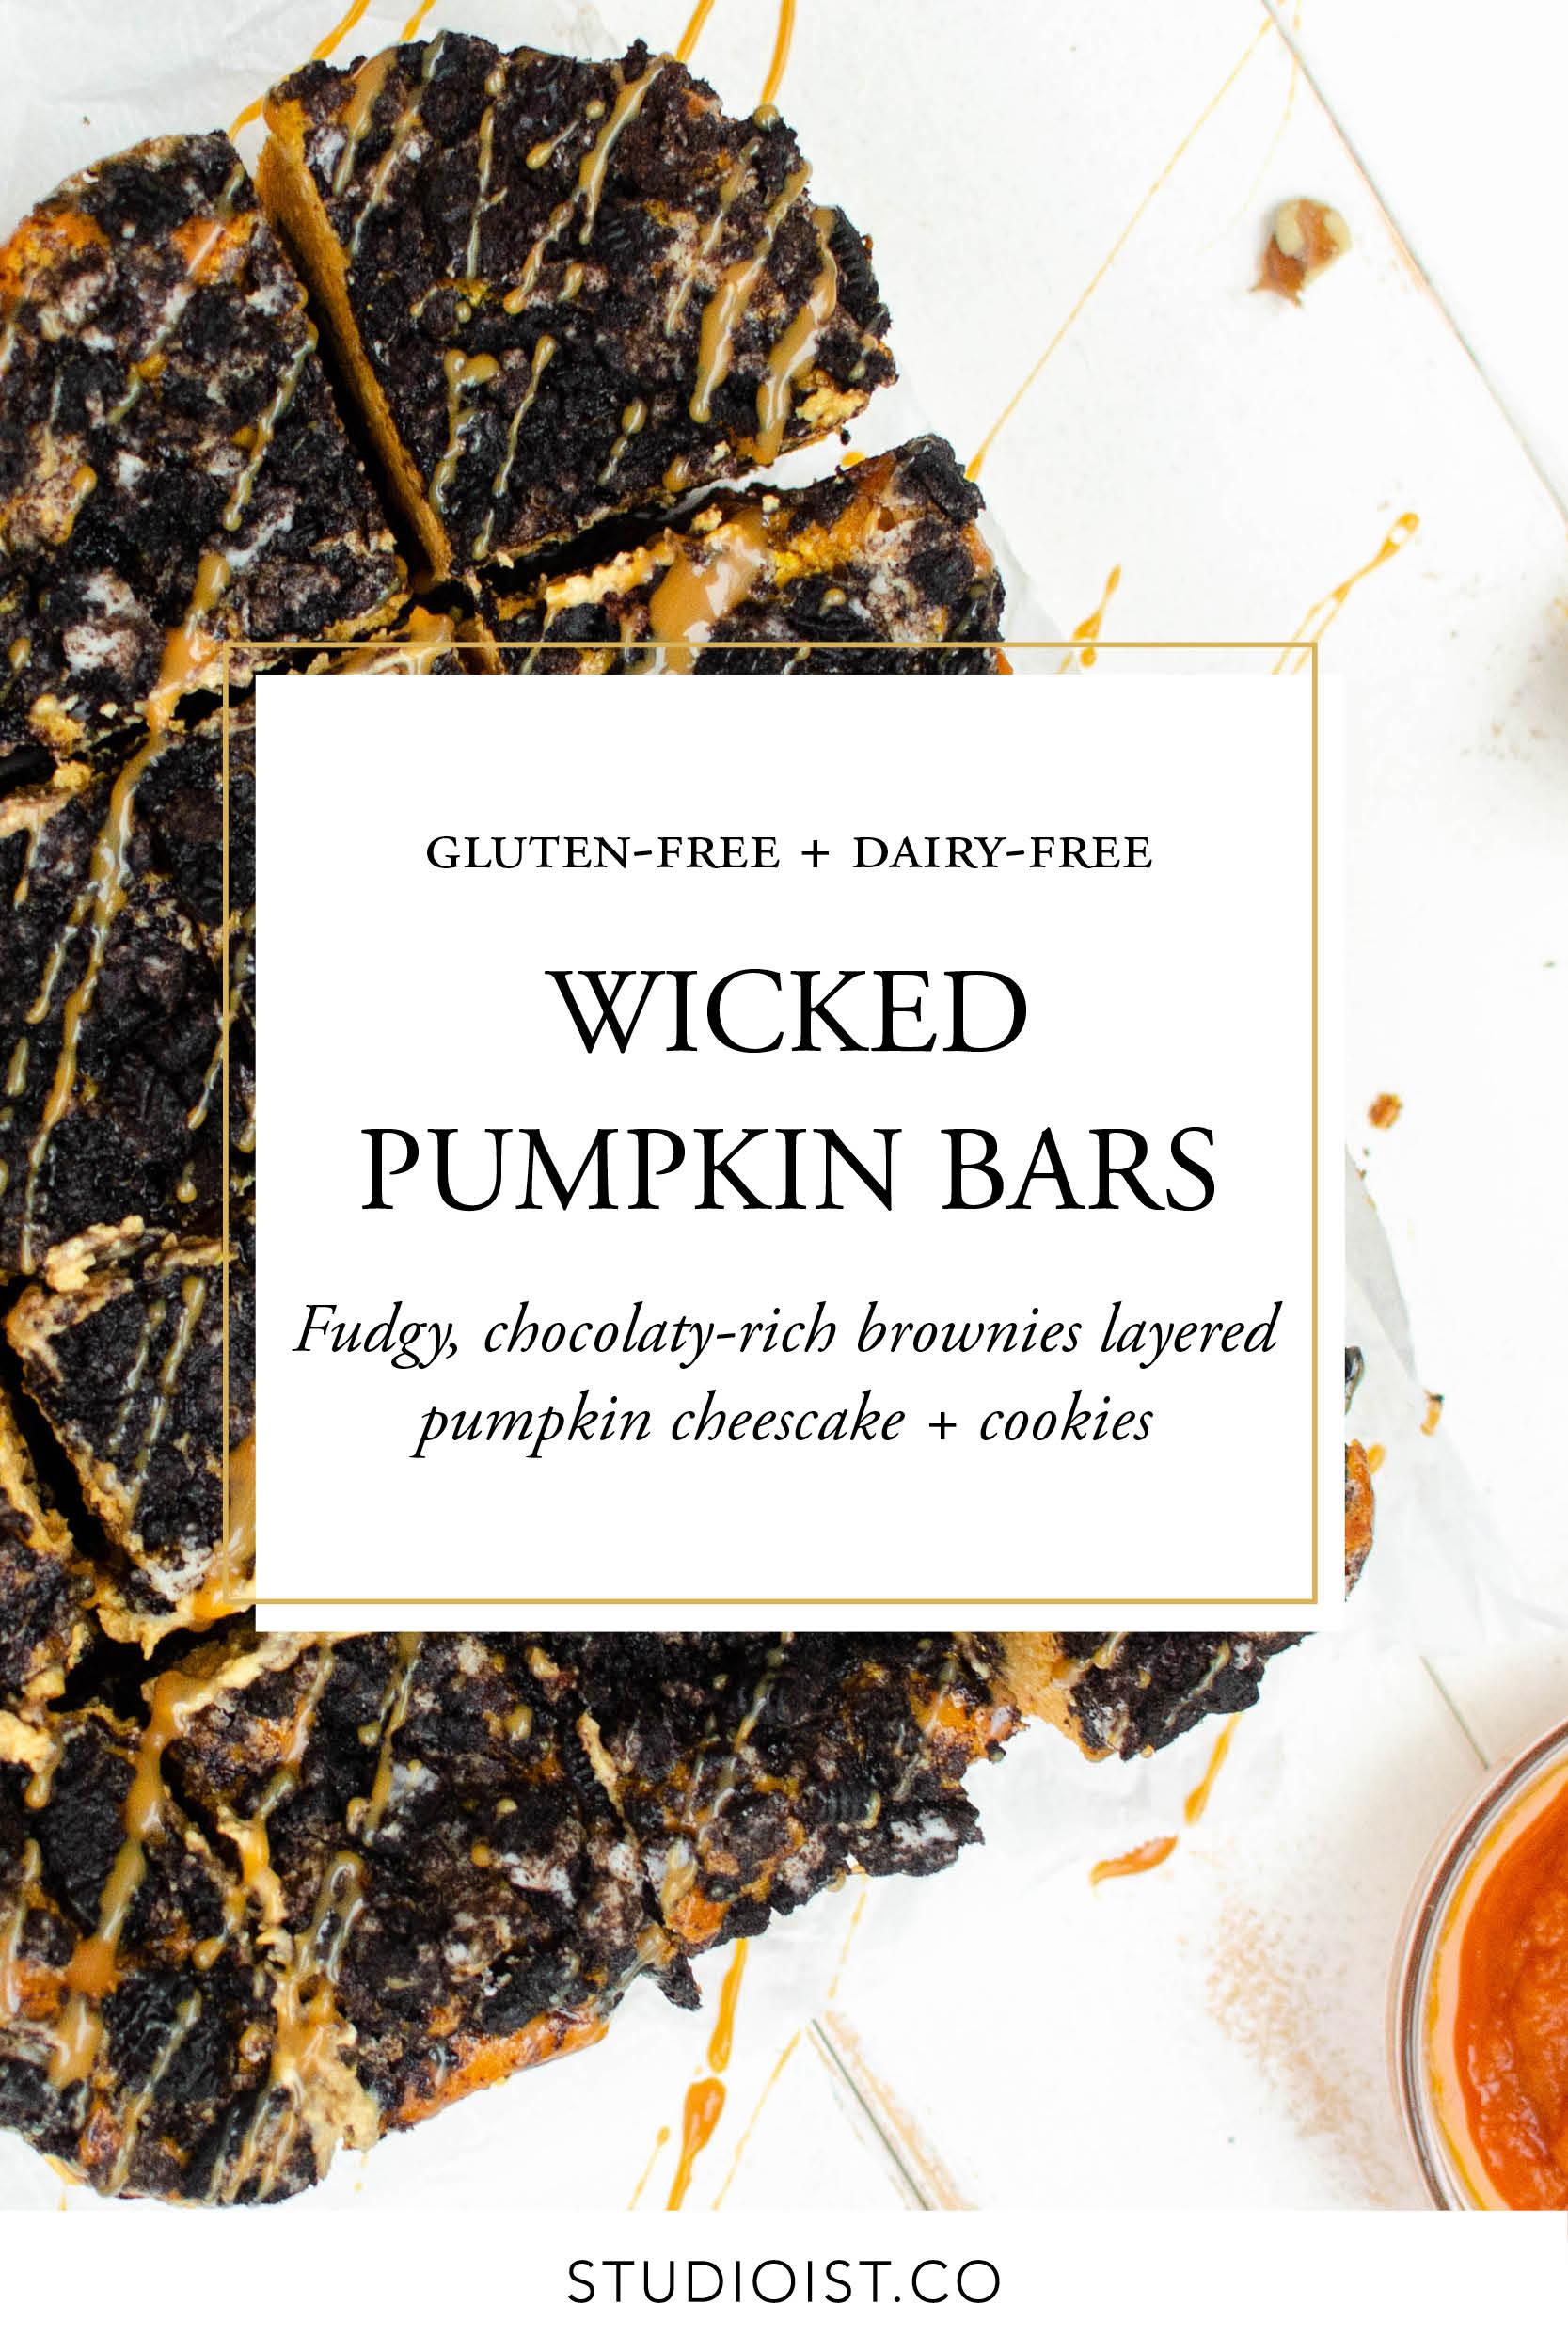 Studioist_Pinterest Design_WickedPumpkinBars.jpg